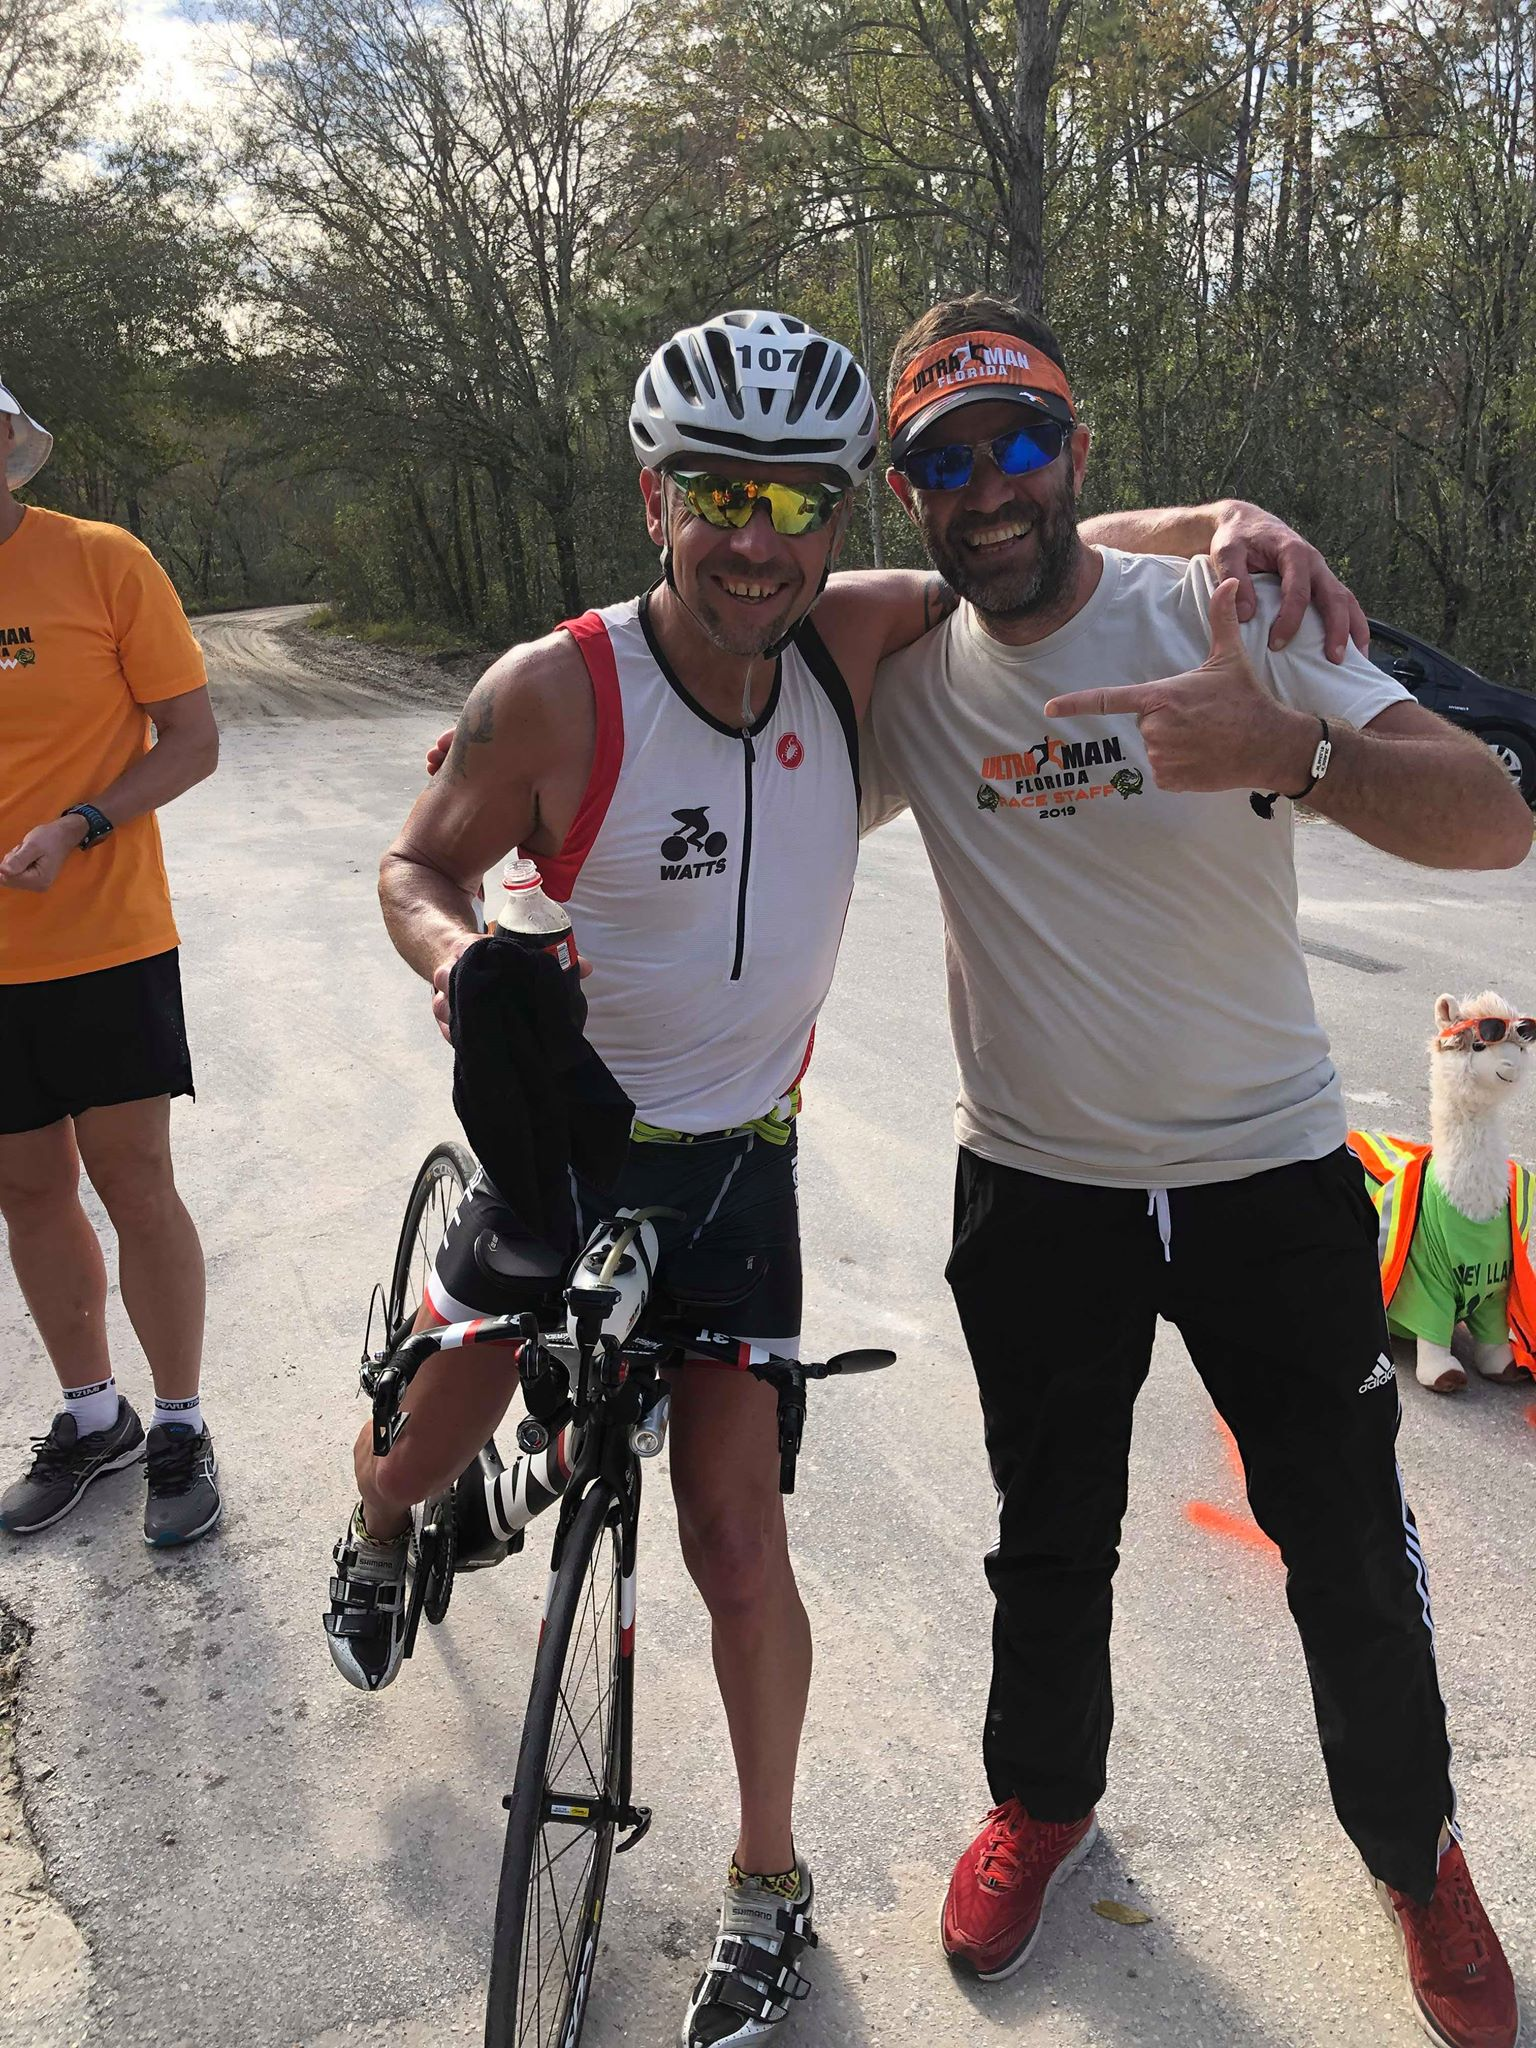 Coach_Terry_Wilson_Pursuit_of_The_Perfect_Race_Ultraman_Florida_Chris_Pollack_1.jpg